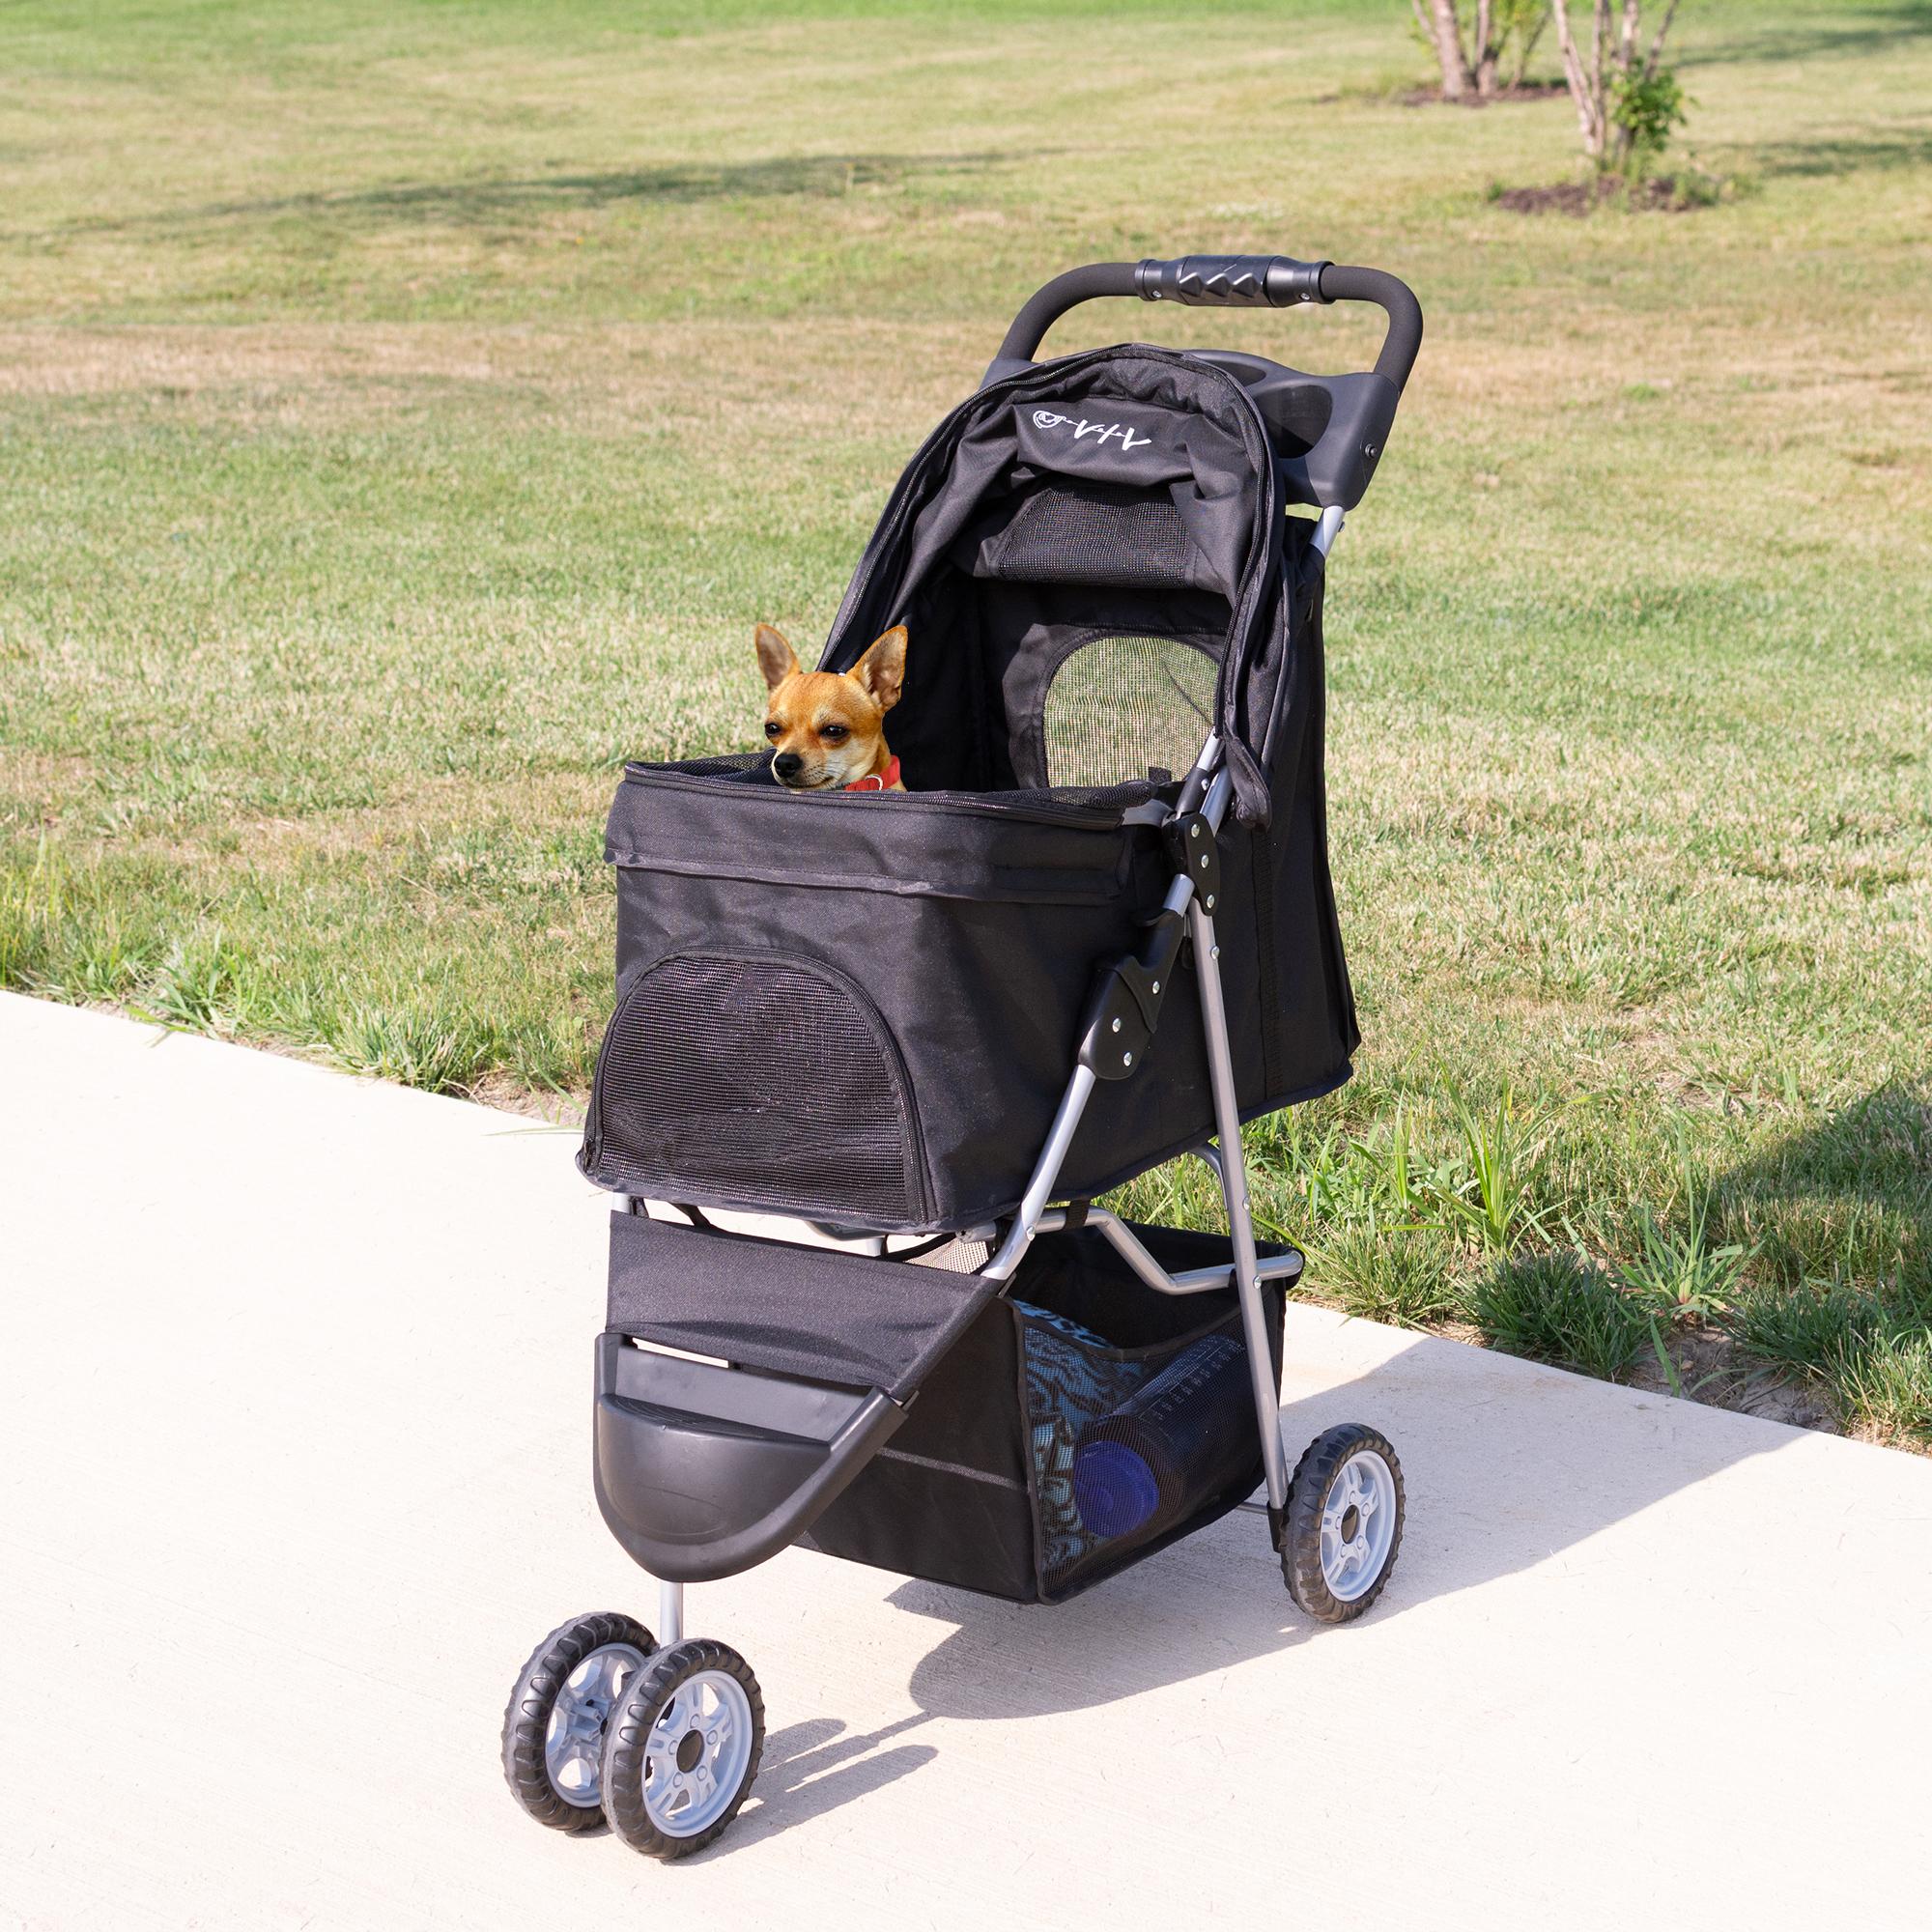 thumbnail 9 - VIVO Three Wheel Pet Stroller / Cat & Dog Foldable Carrier Strolling Cart